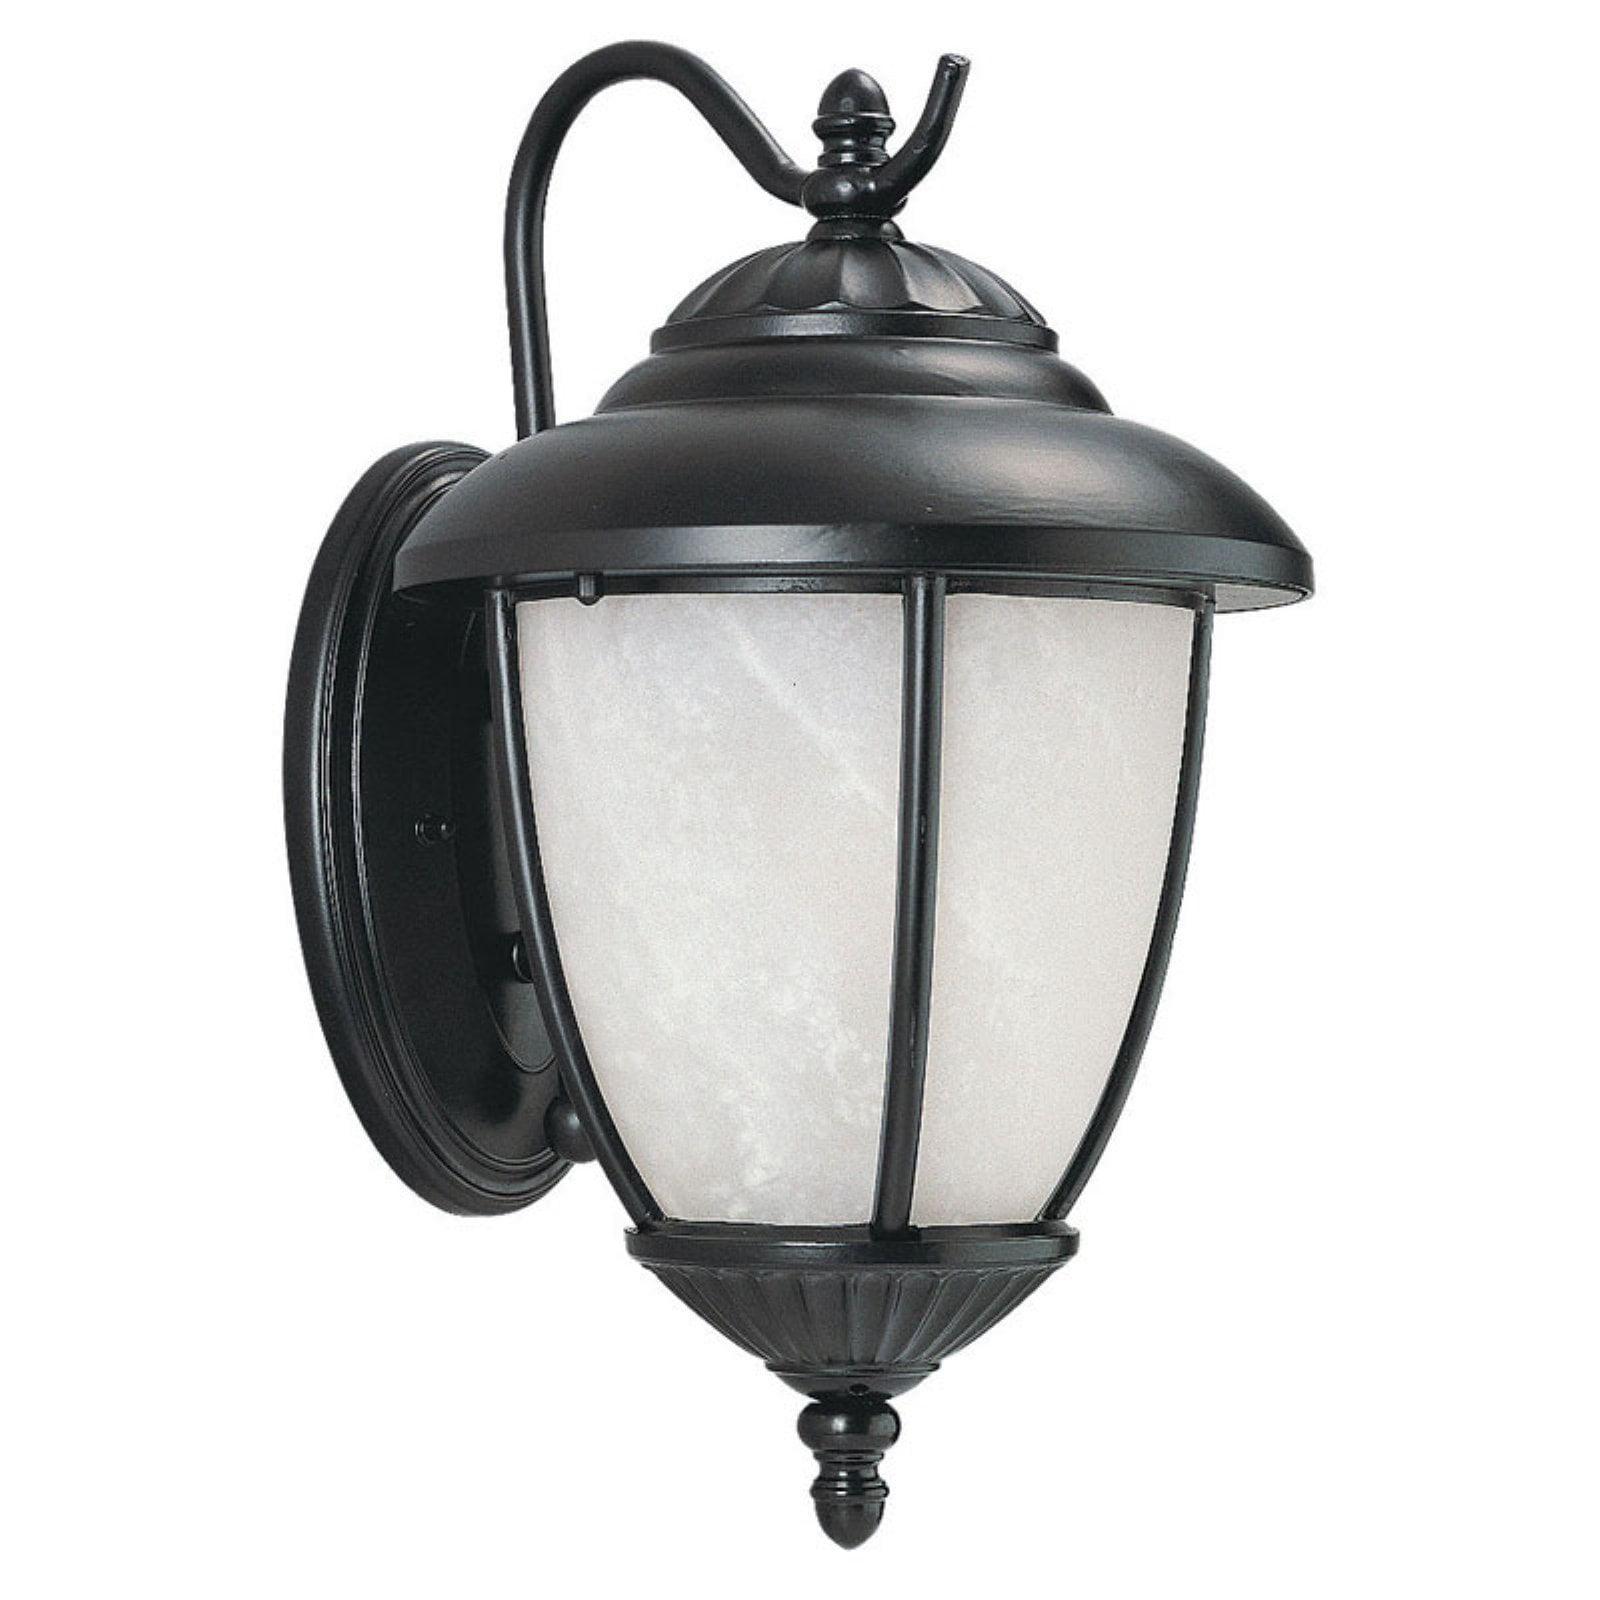 Sea Gull Yorktowne Outdoor Wall Lantern - 13.25H in. Forged Iron - ENERGY STAR